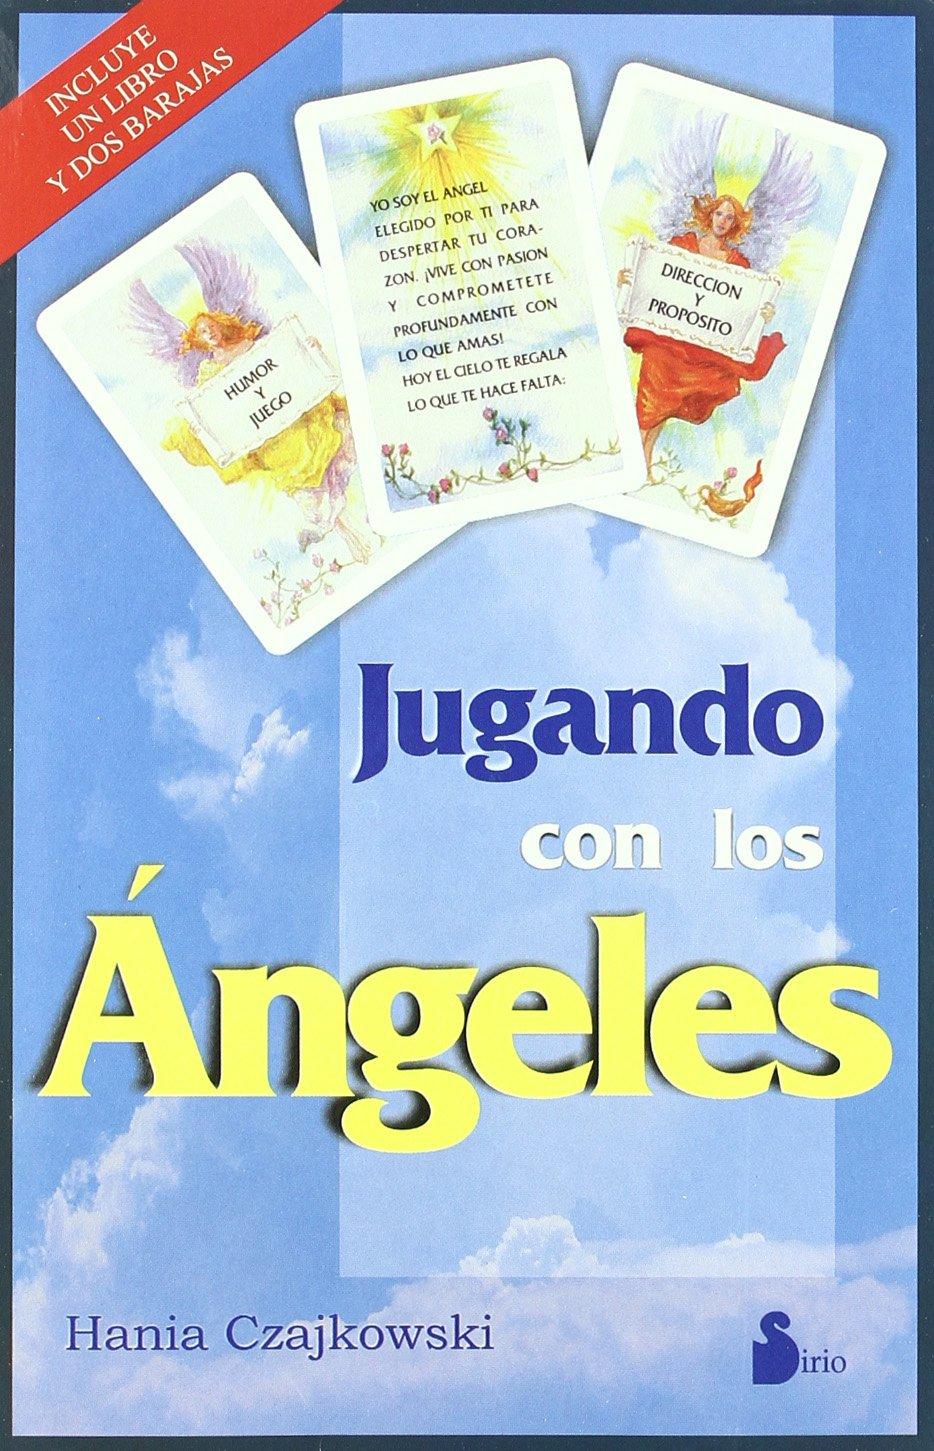 Jugando Con Los Angeles (Spanish Edition): Hania Czajkowski ...